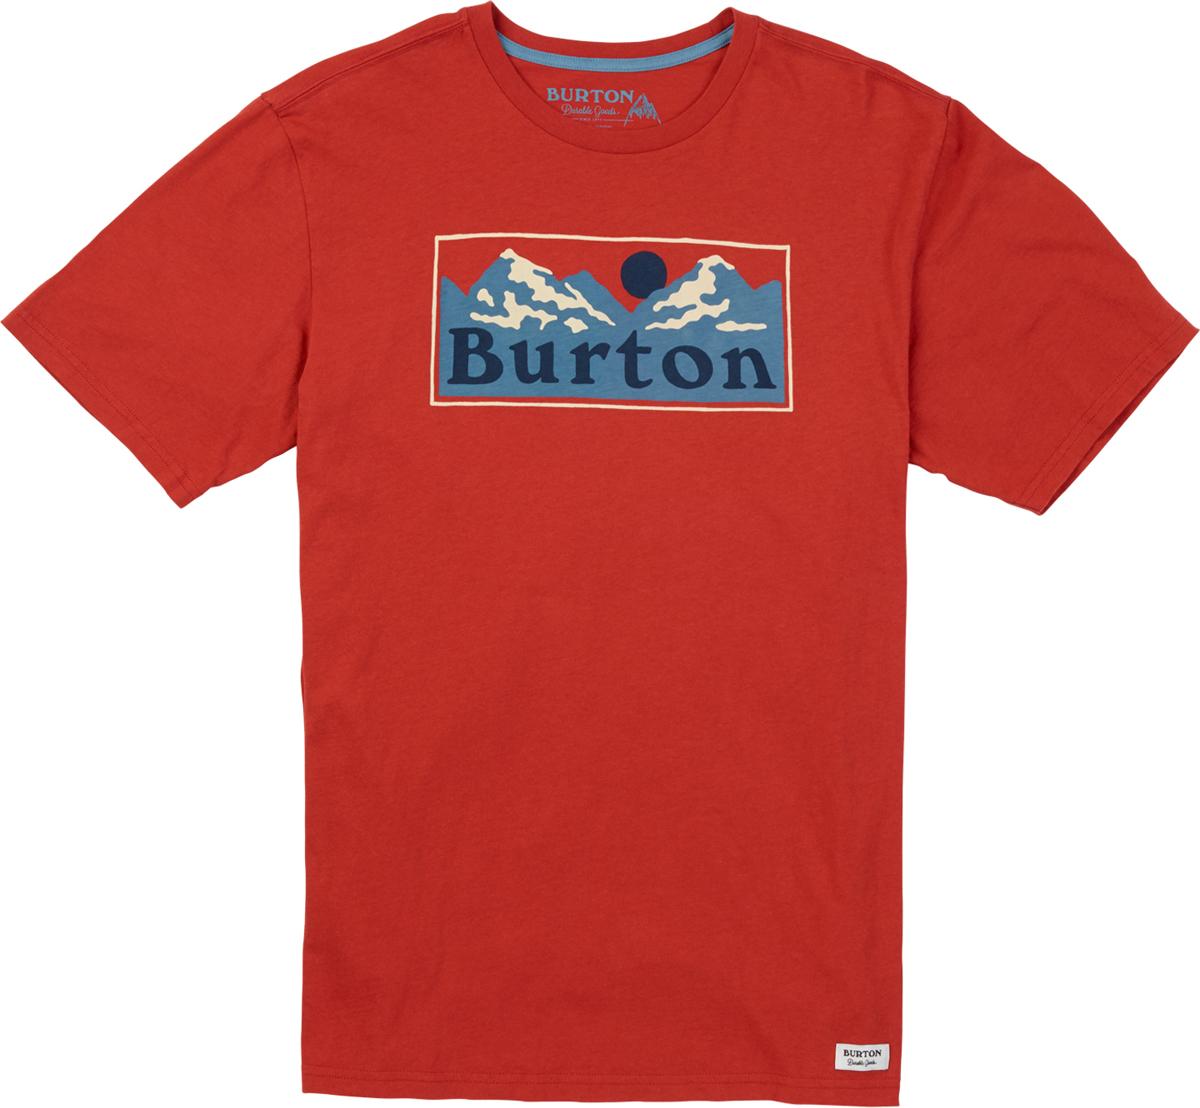 Футболка мужская Burton Mb Ralleye Ss, цвет: красный. 19691100600. Размер XL (52) burton футболка ж трик wb keeler vneck ss m twilight mauve sp18